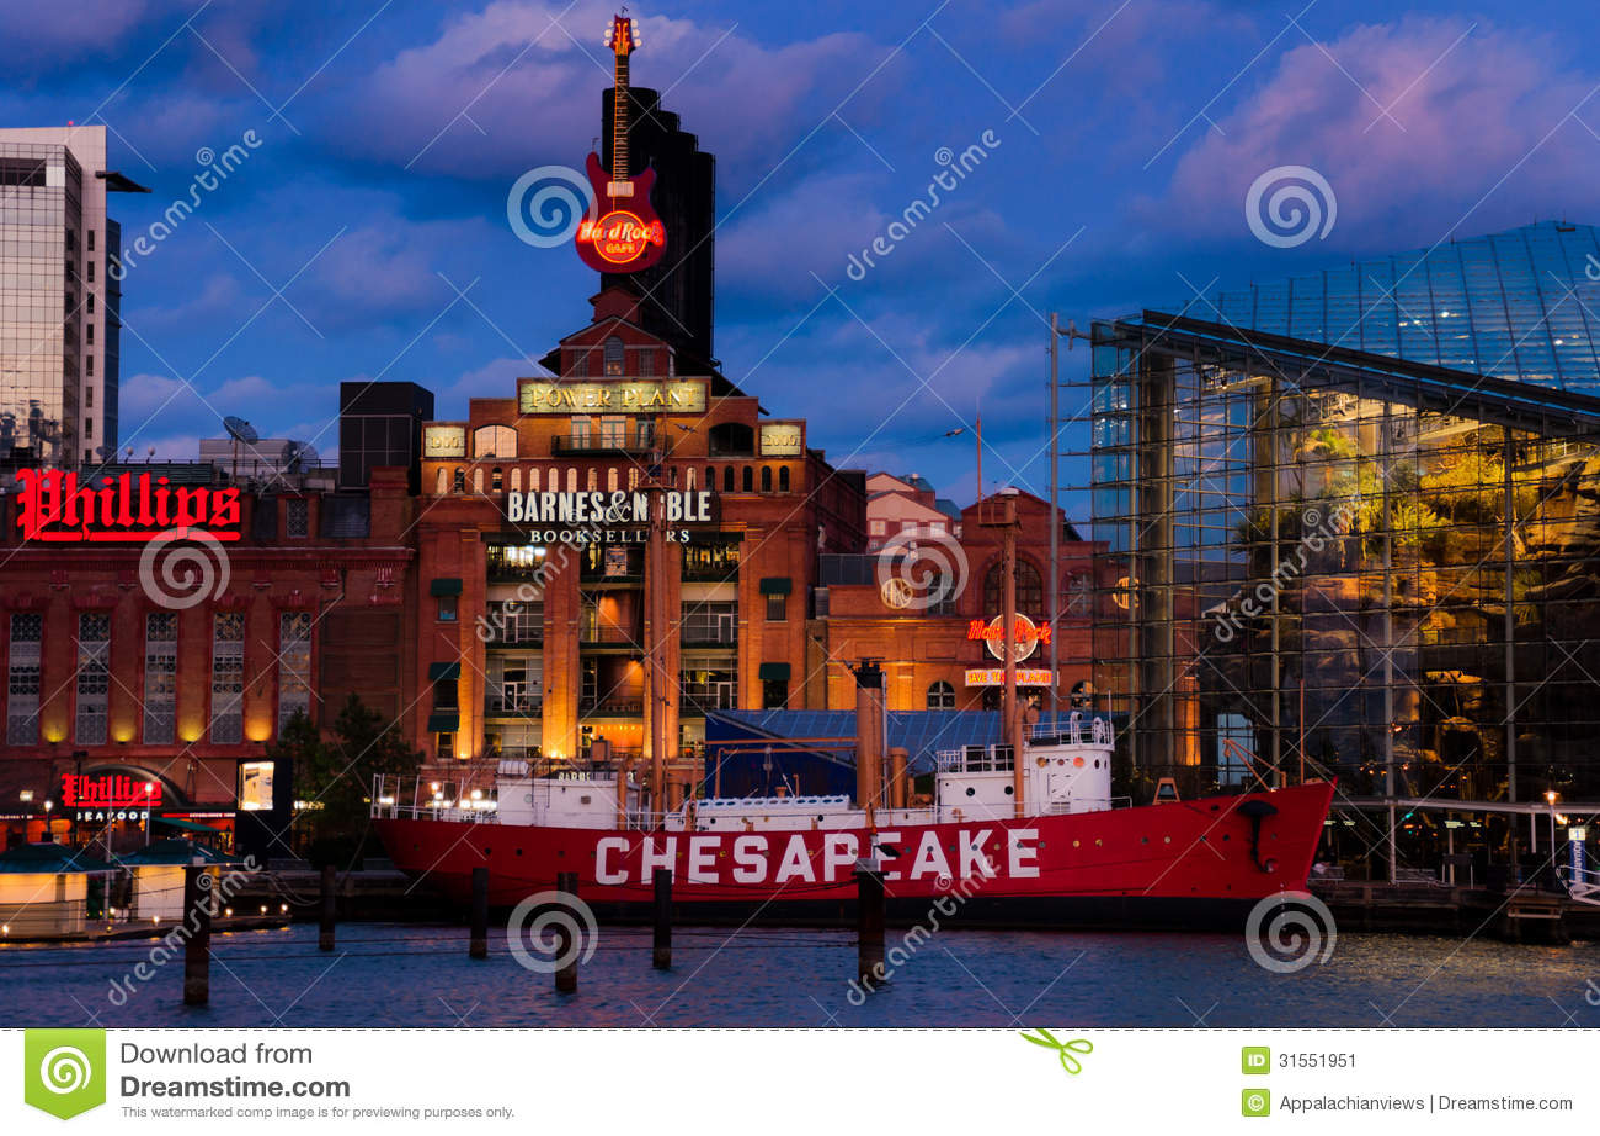 Fast Food Baltimore Inner Harbor